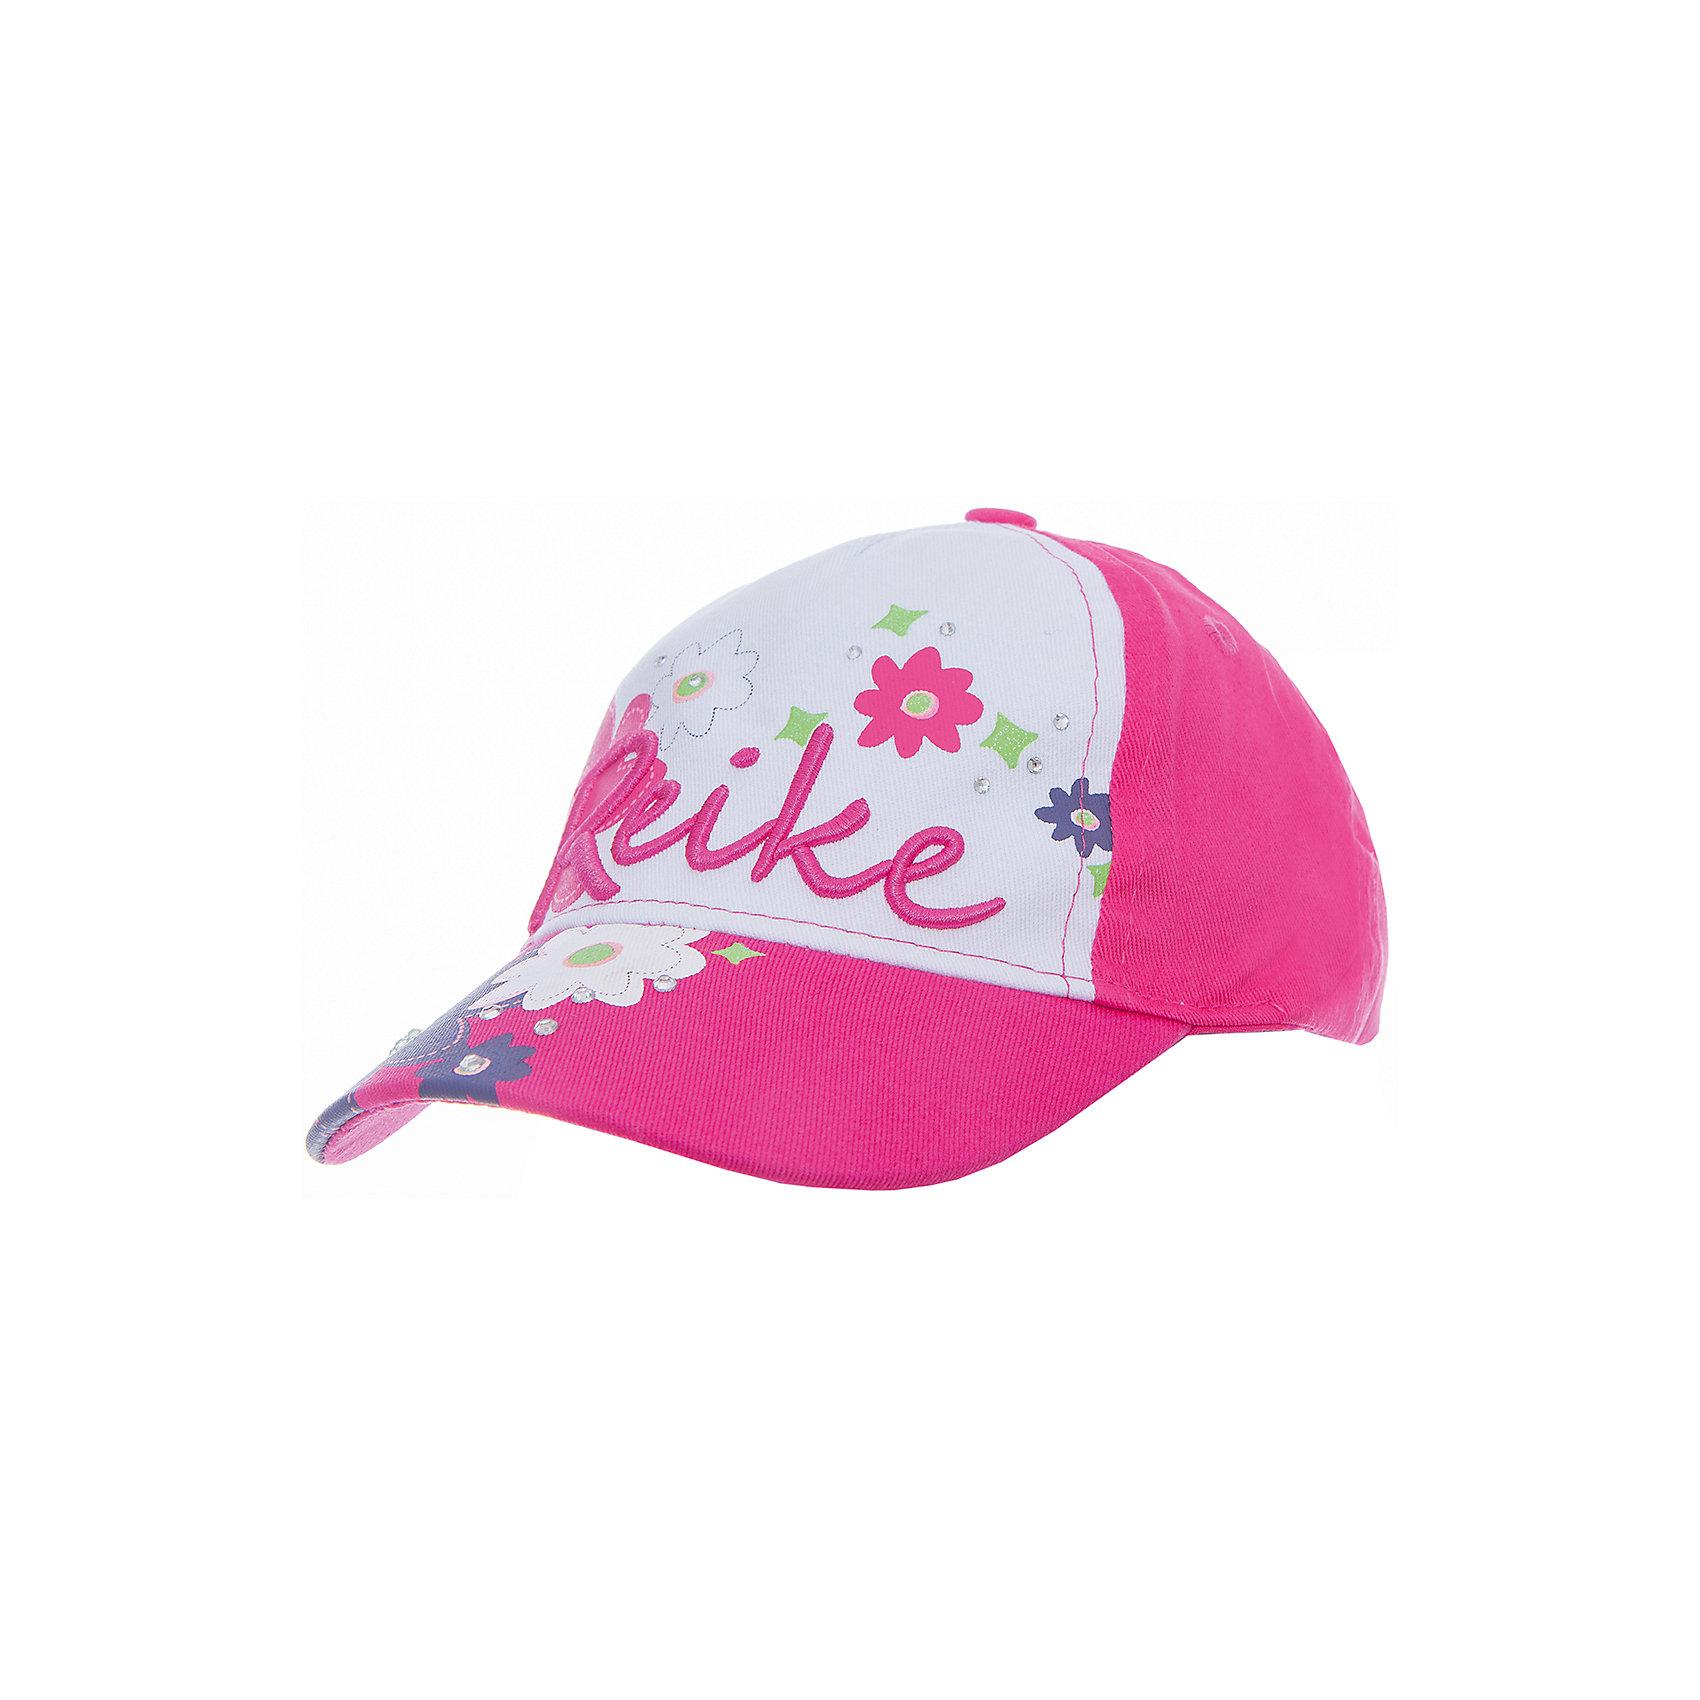 Кепка Reike для девочки